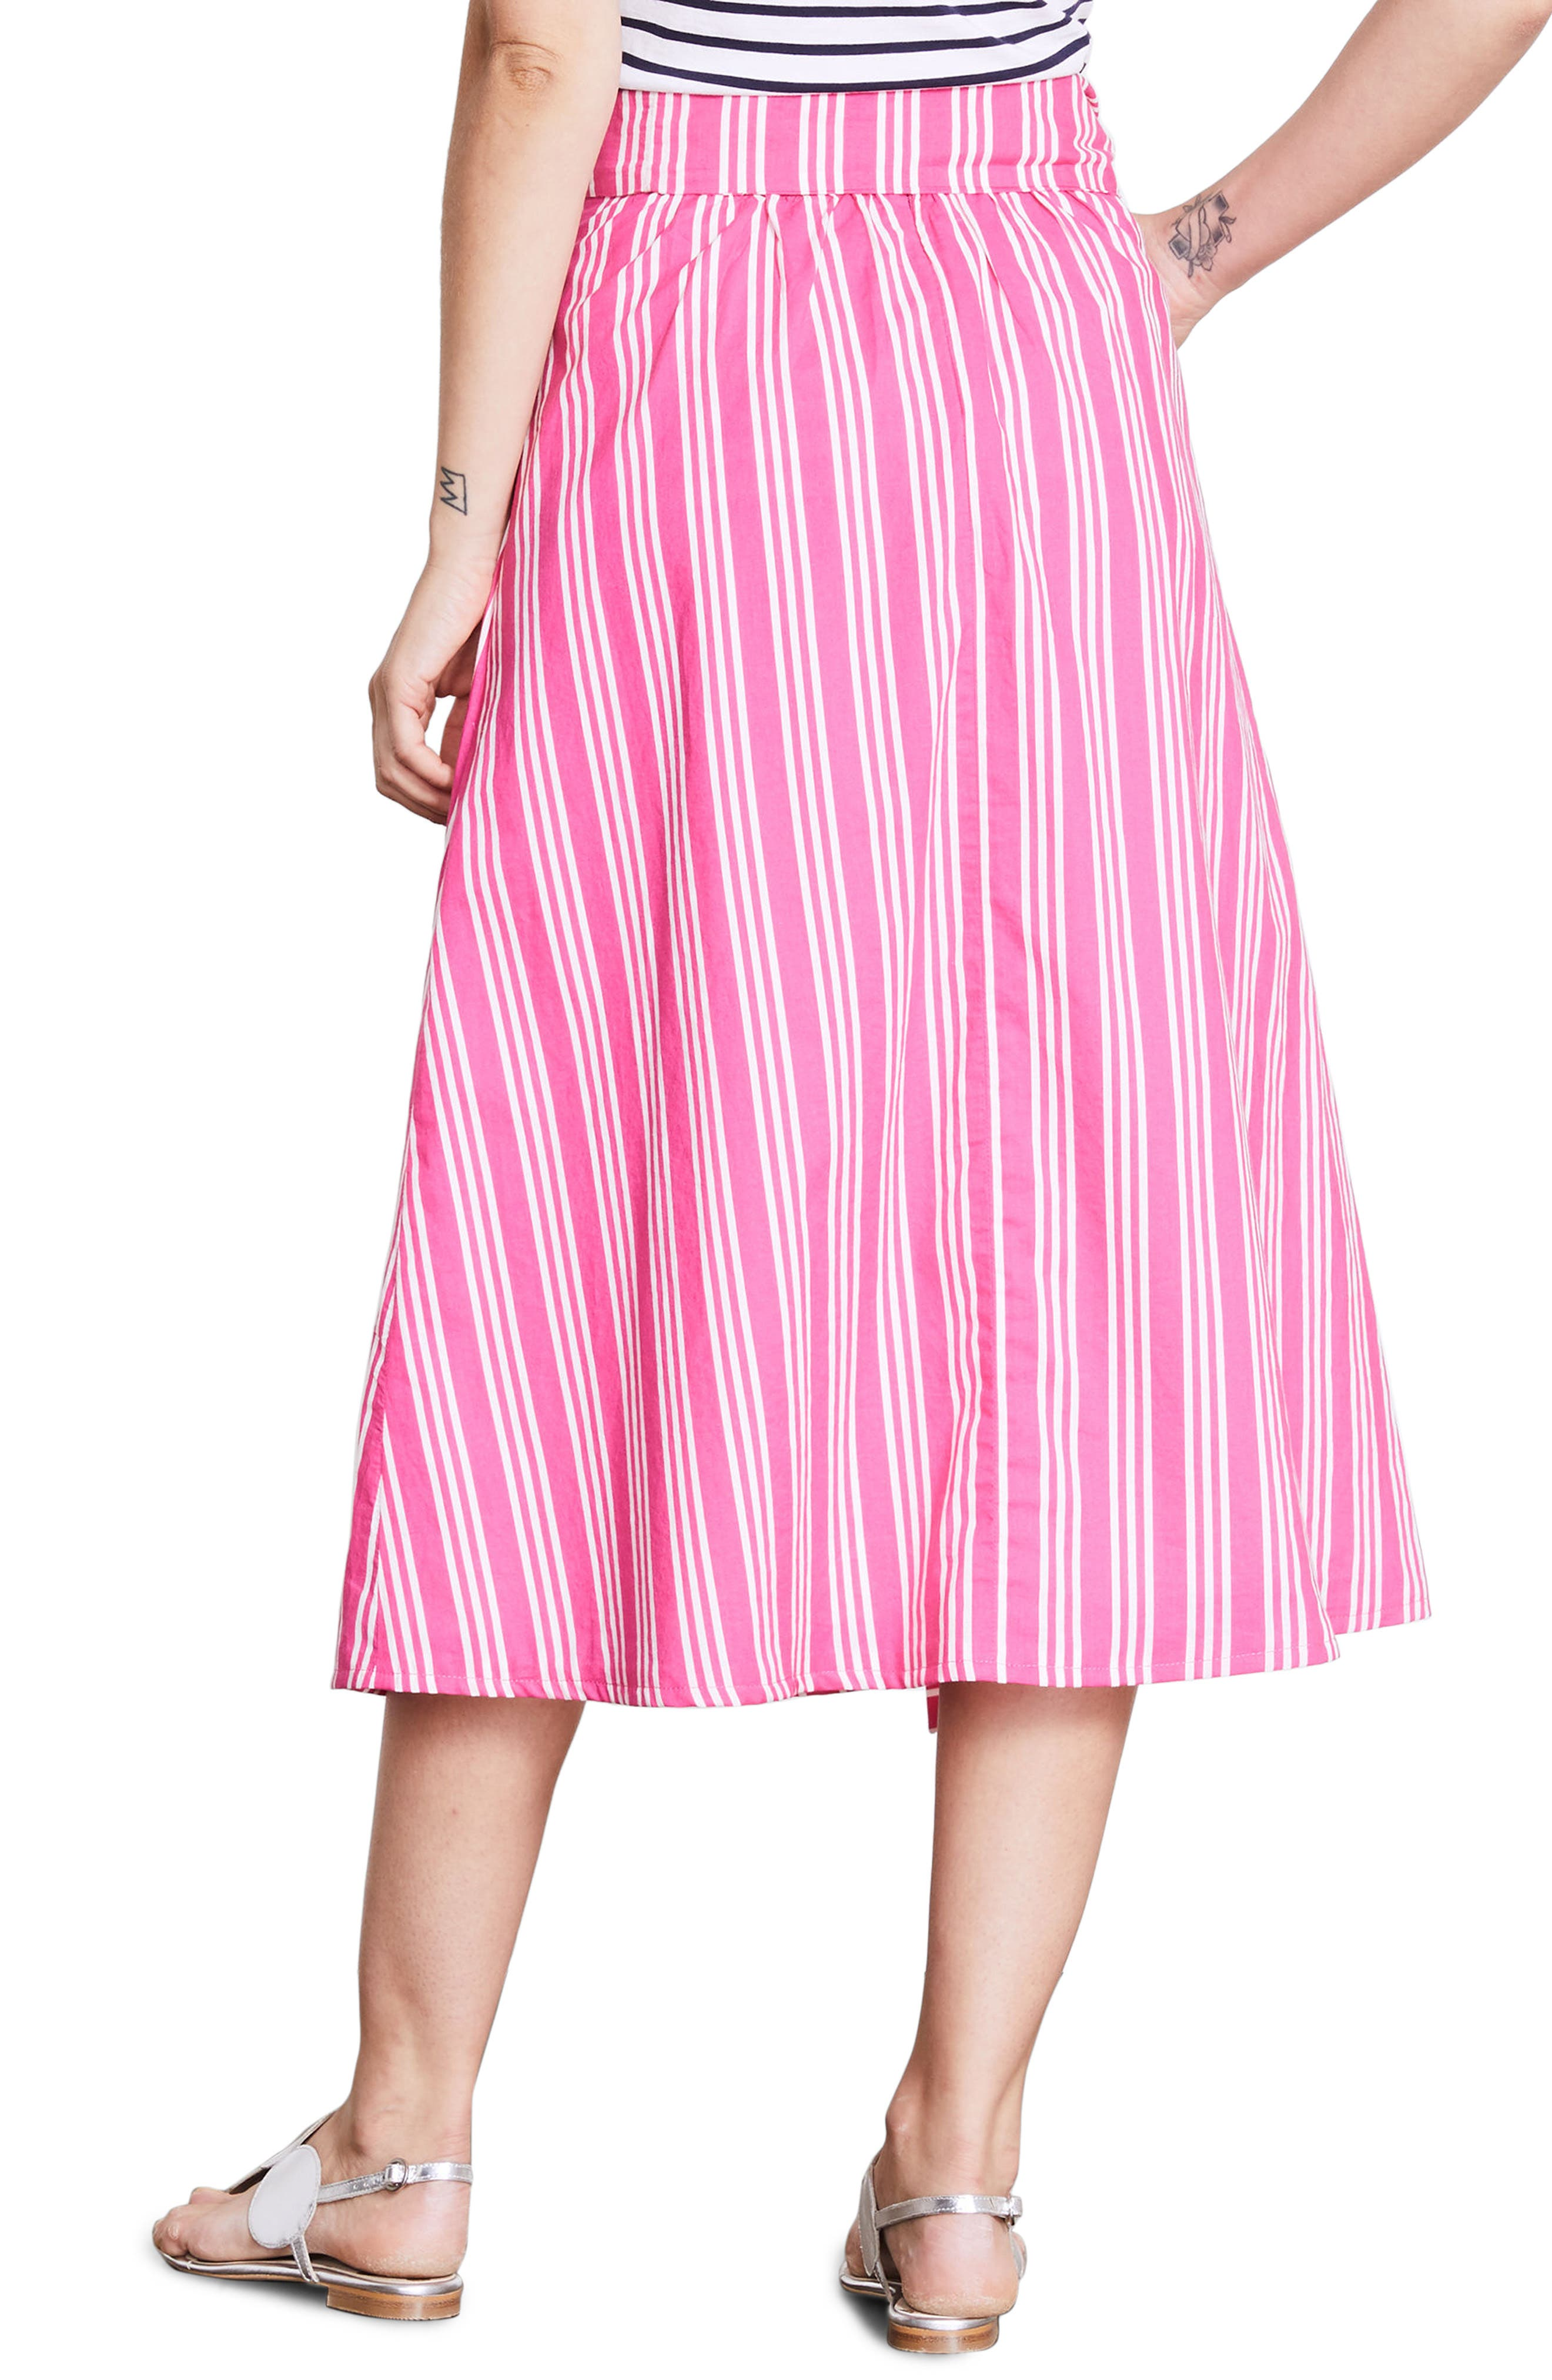 Kiera Midi Skirt,                             Alternate thumbnail 3, color,                             Party Pink And Ecru